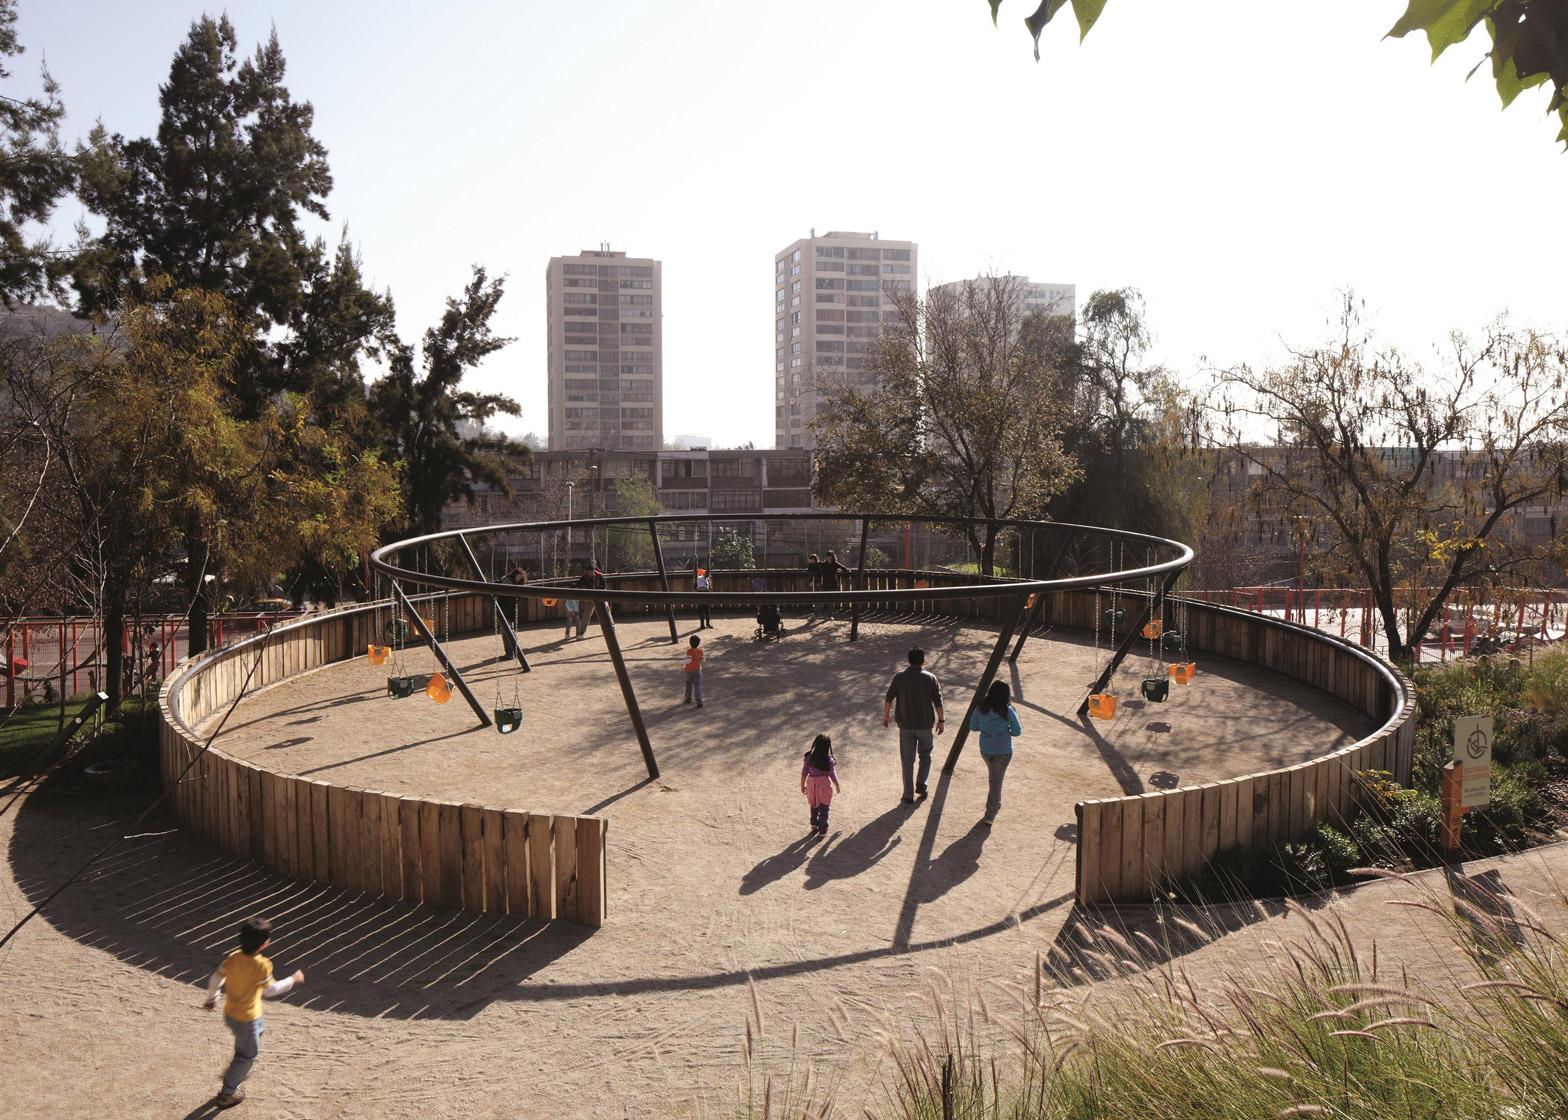 Bicentennial Children's Park, Santiago, 2012